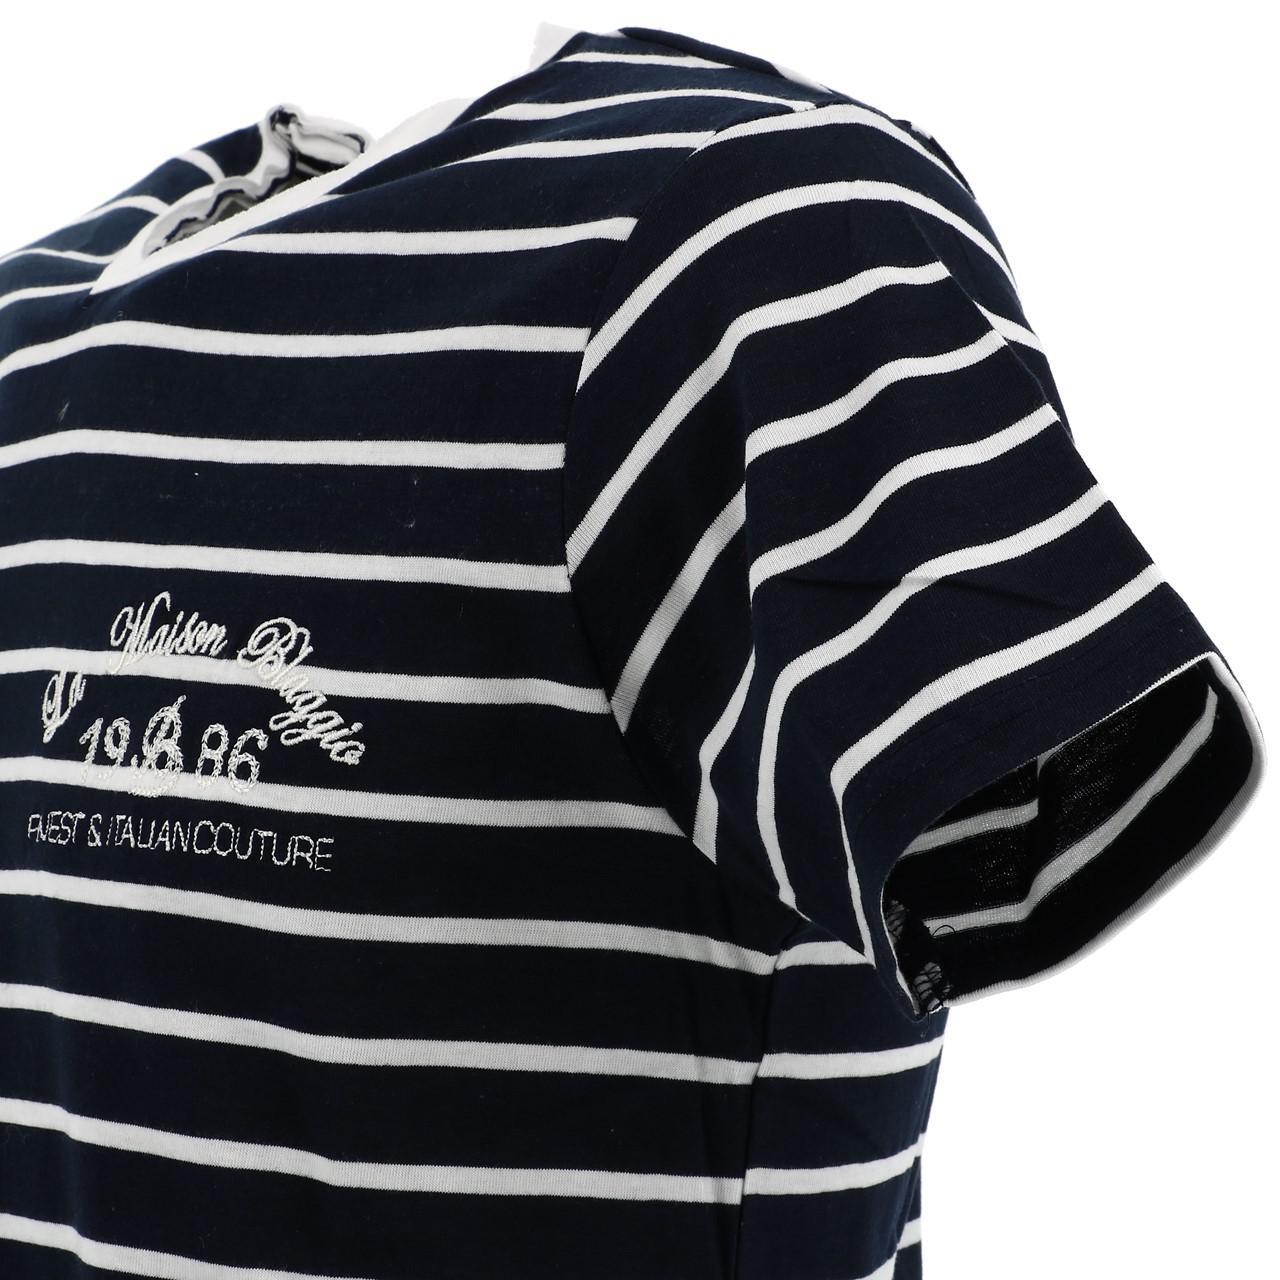 Short-Sleeve-T-Shirt-La-Maison-Blaggio-Mavili-Navy-Wht-Mc-Tee-Blue-27335 thumbnail 3